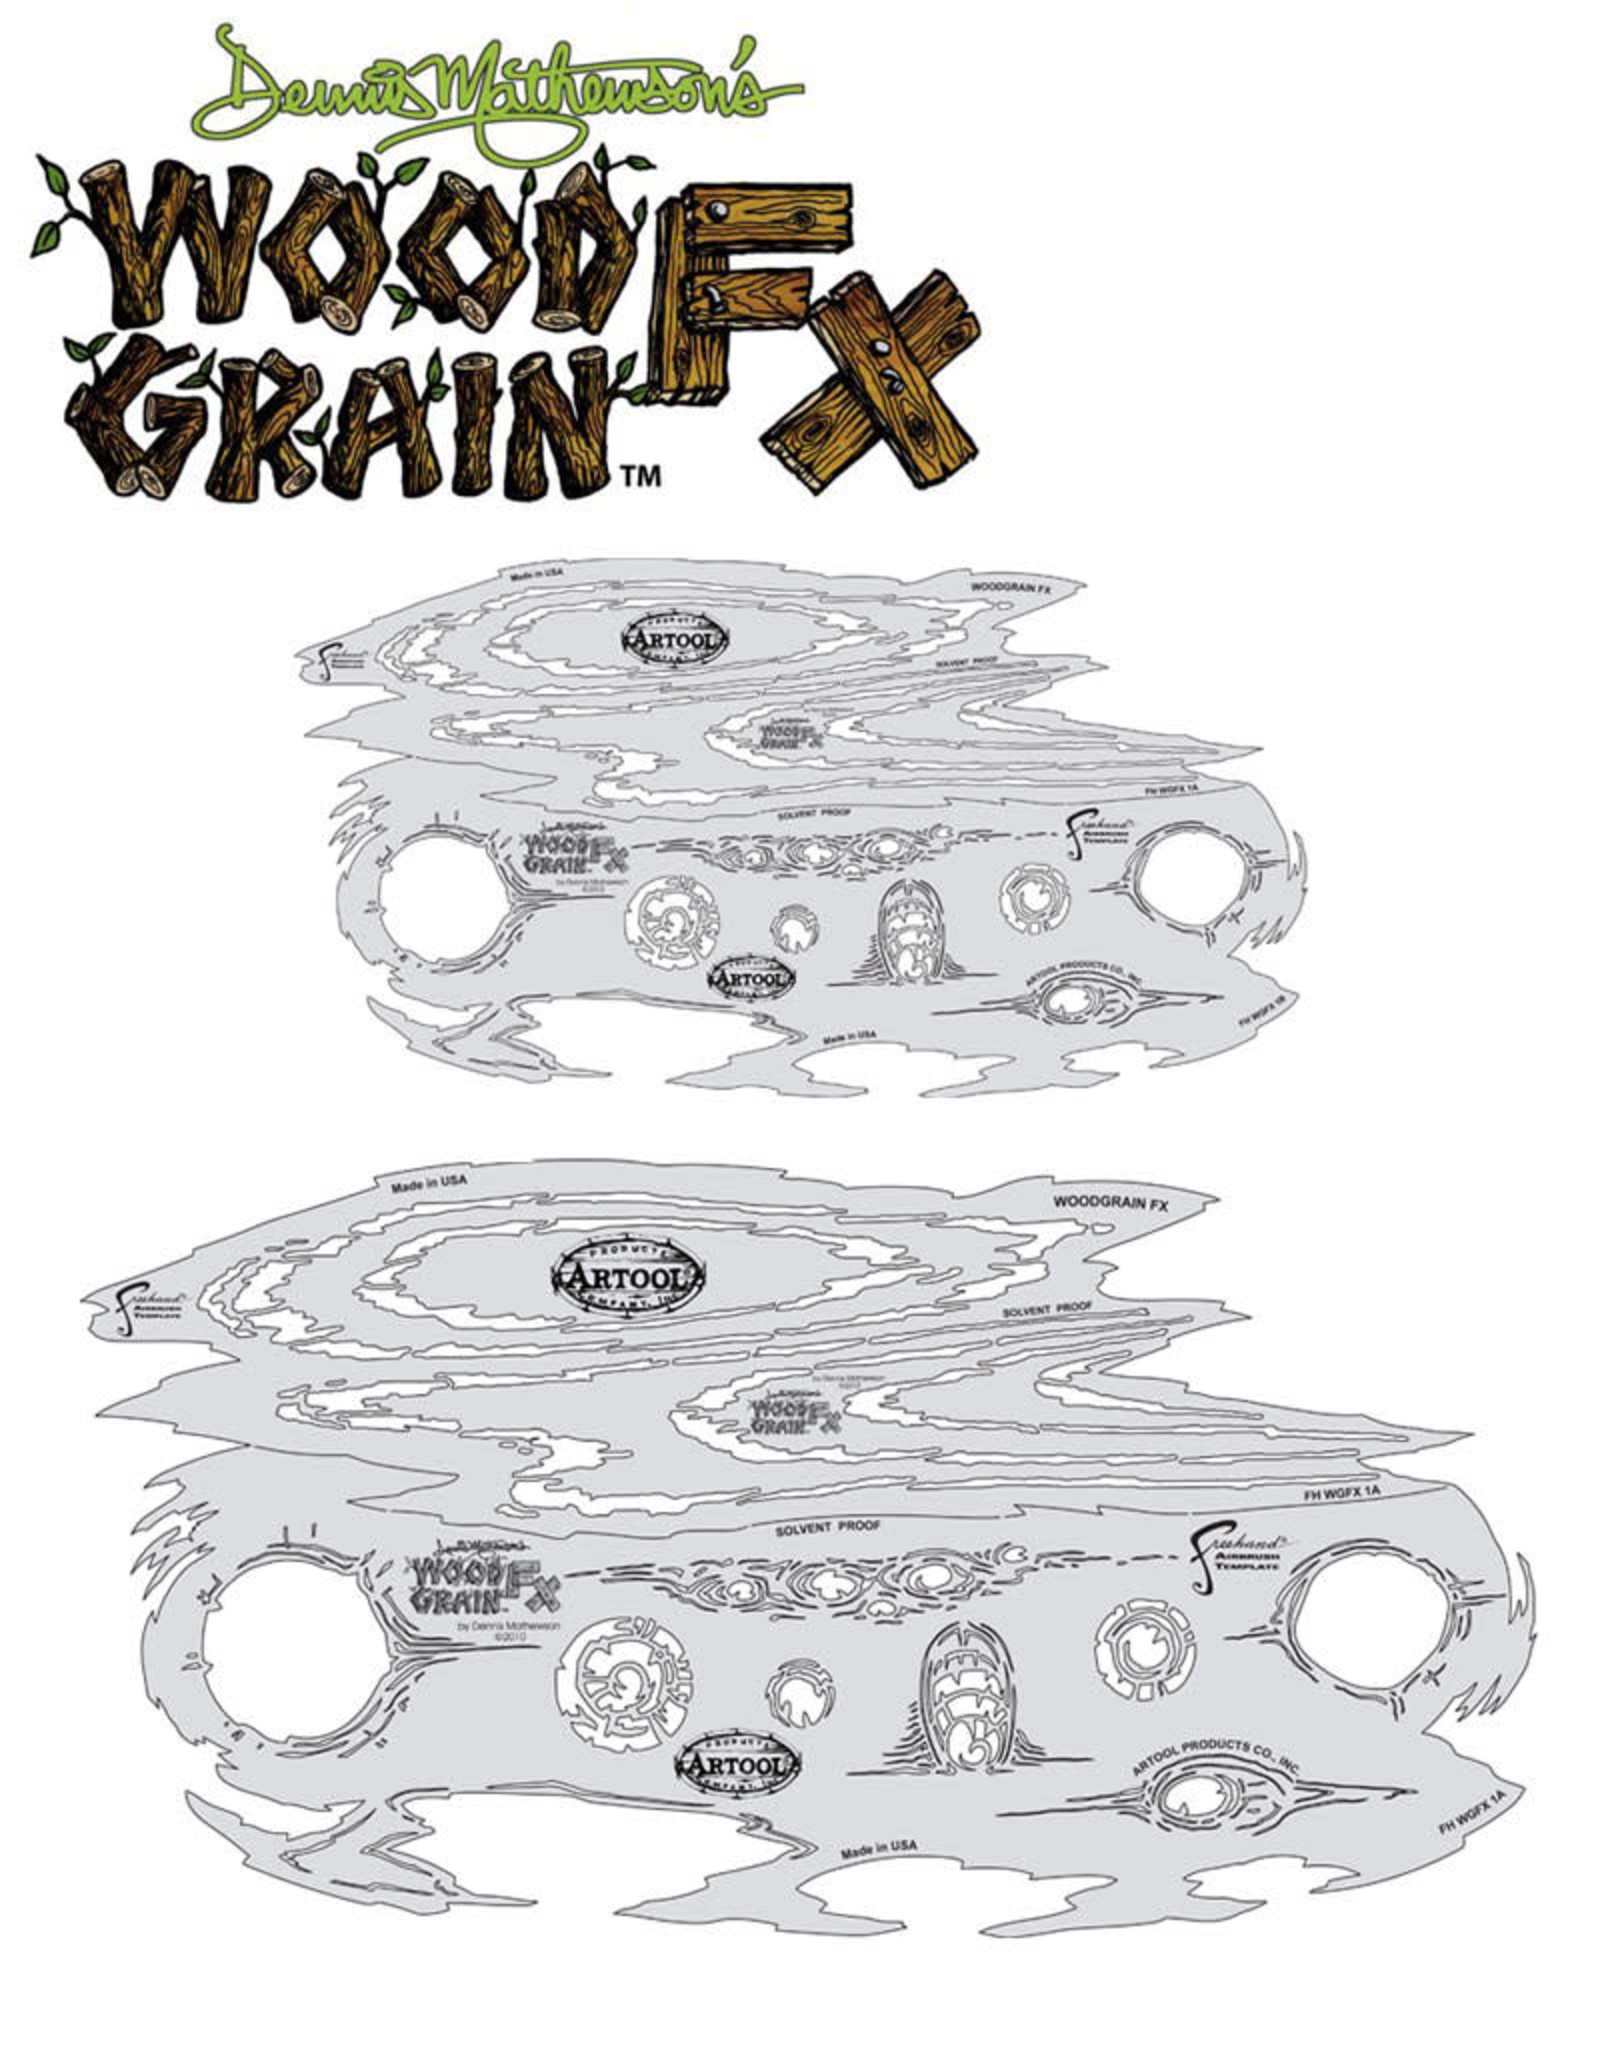 Artool Artool Wood Grain FX Freehand Airbrush Template Set by Dennis Mathewson